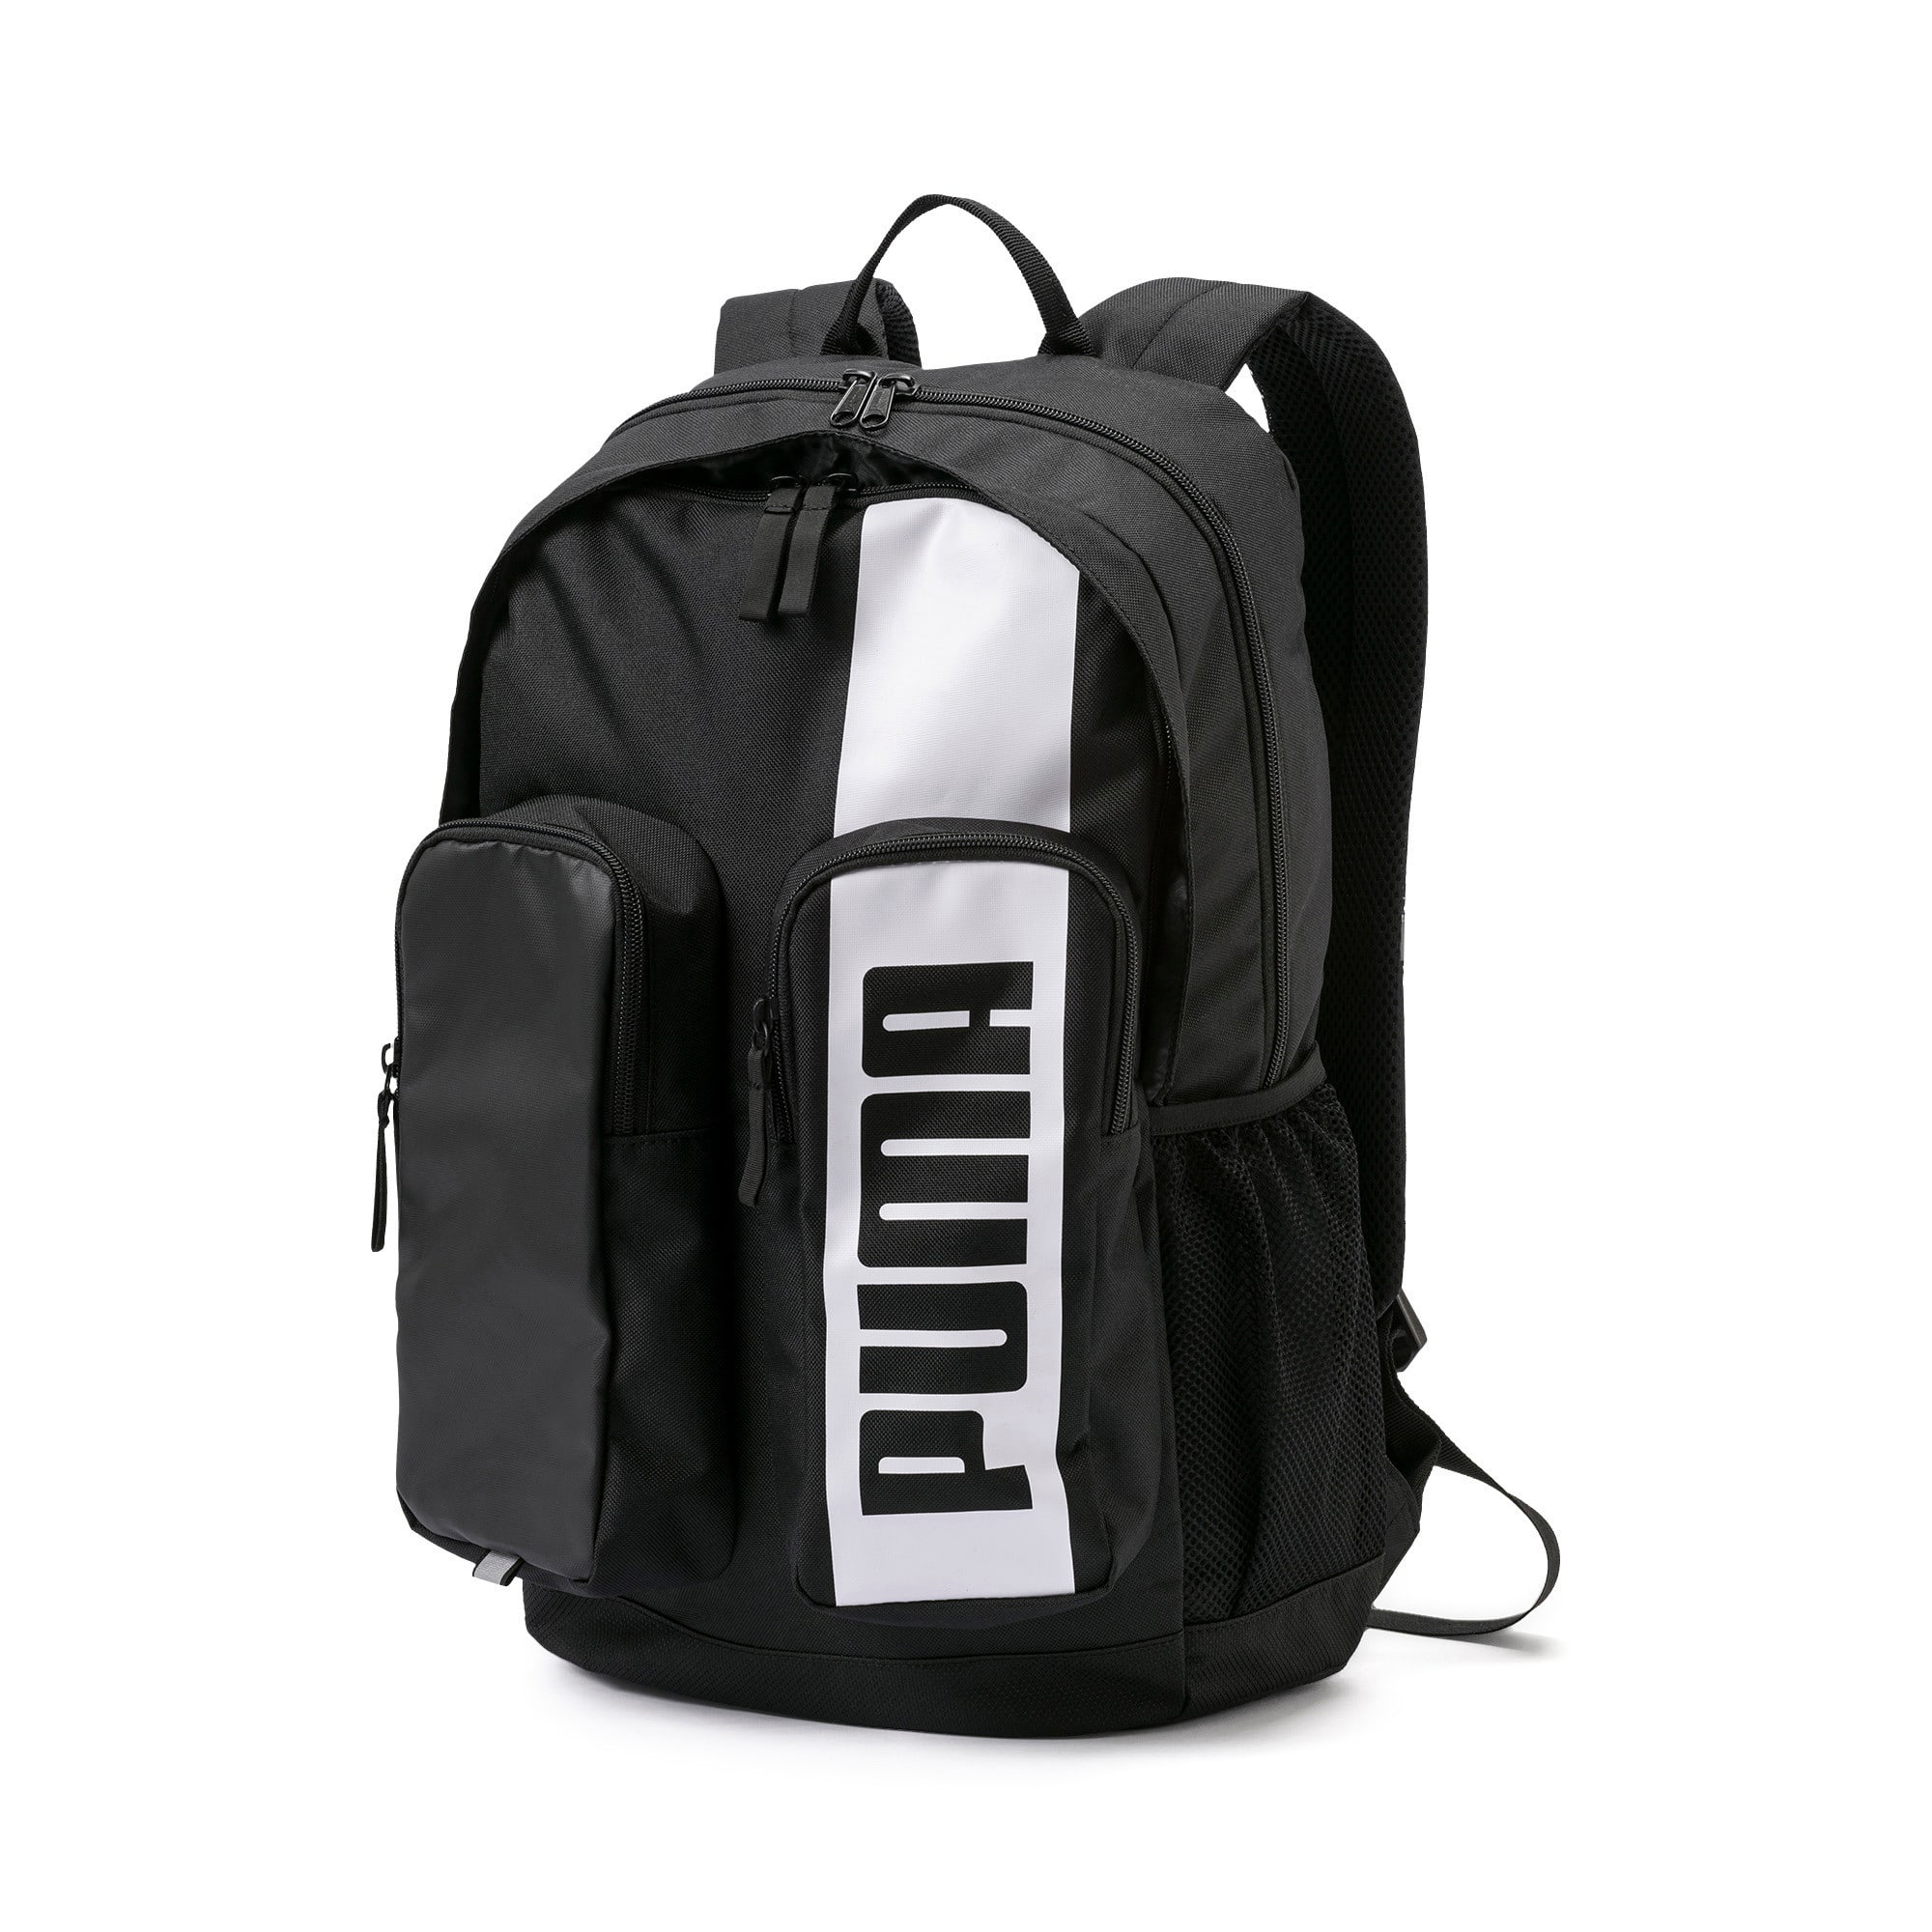 Thumbnail 1 of Deck Backpack II, Puma Black, medium-IND